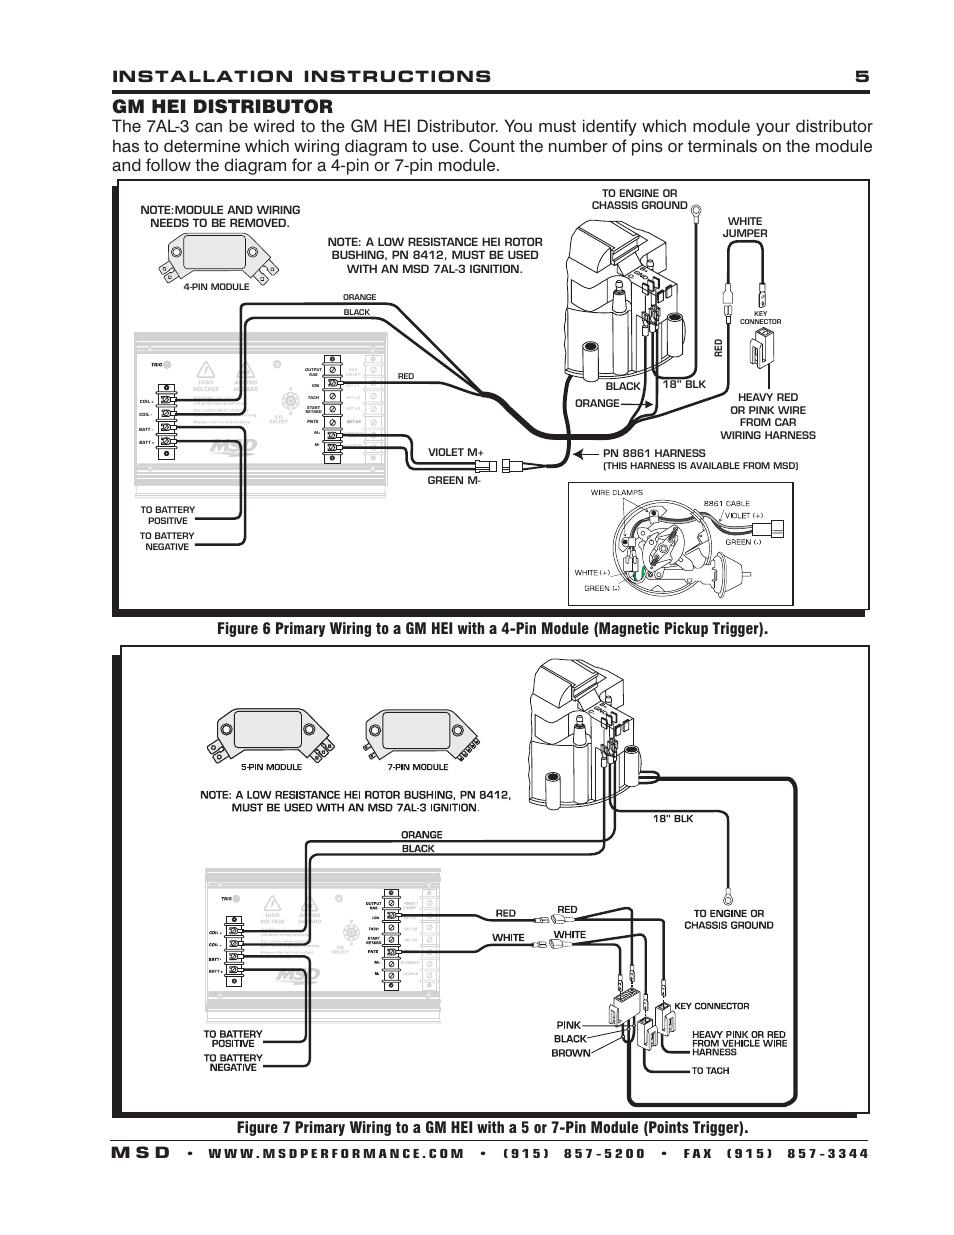 DIAGRAM] Msd 7al 3 Wiring Diagram FULL Version HD Quality Wiring Diagram -  DWIRINGDIAGRAM.CONSTRUCTION-CARACAS.FRdwiringdiagram.construction-caracas.fr